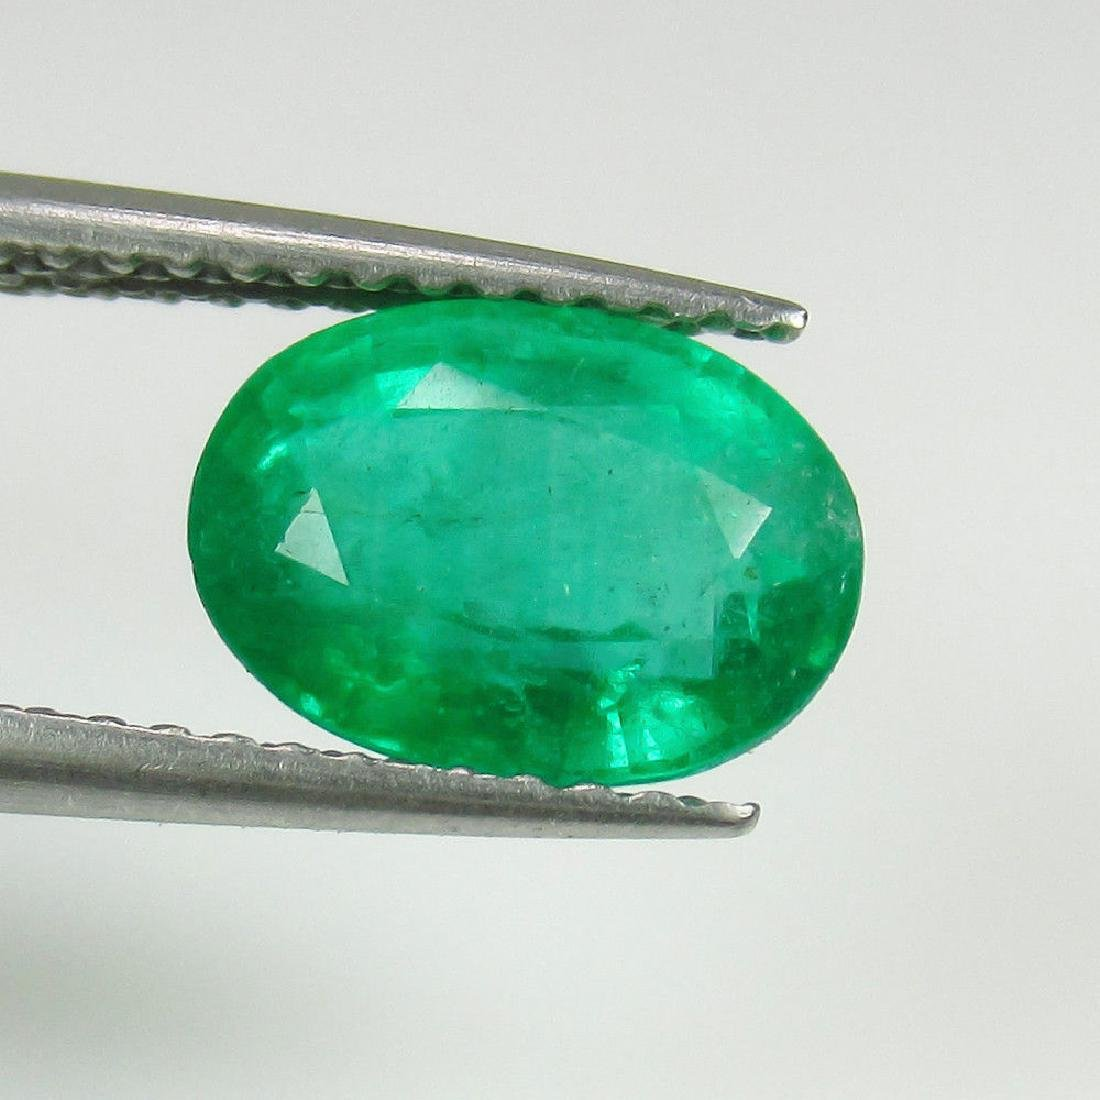 1.95 Ct Genuine Zambian Emerald Top Quality AAA++ Green - 2